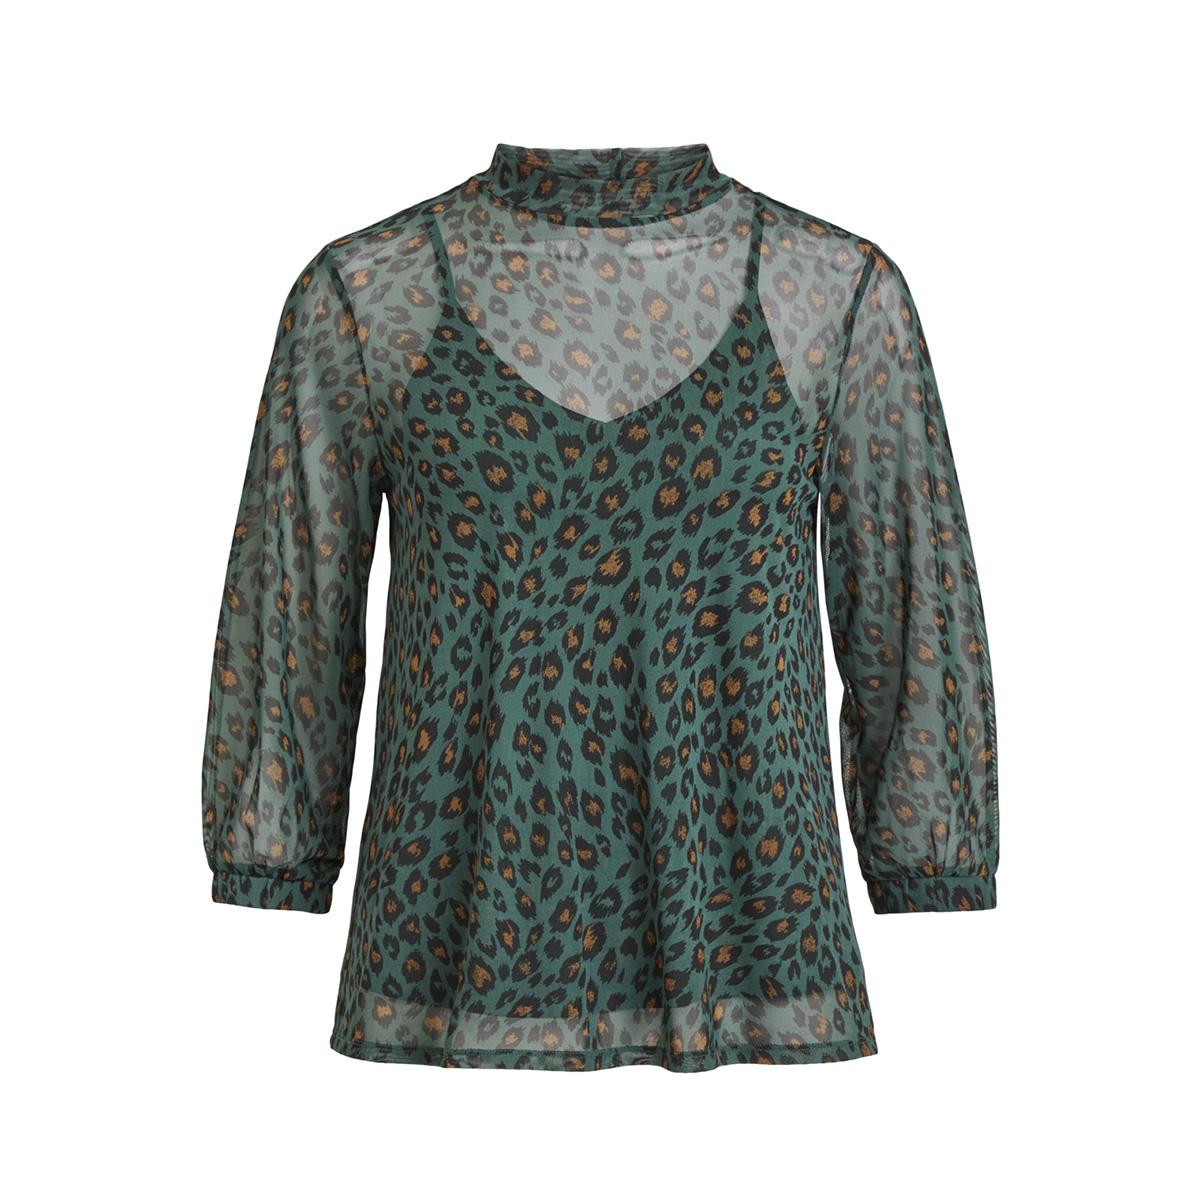 vilastra 3/4 t-shirt/pb 14049881 vila t-shirt garden topiary/tiana